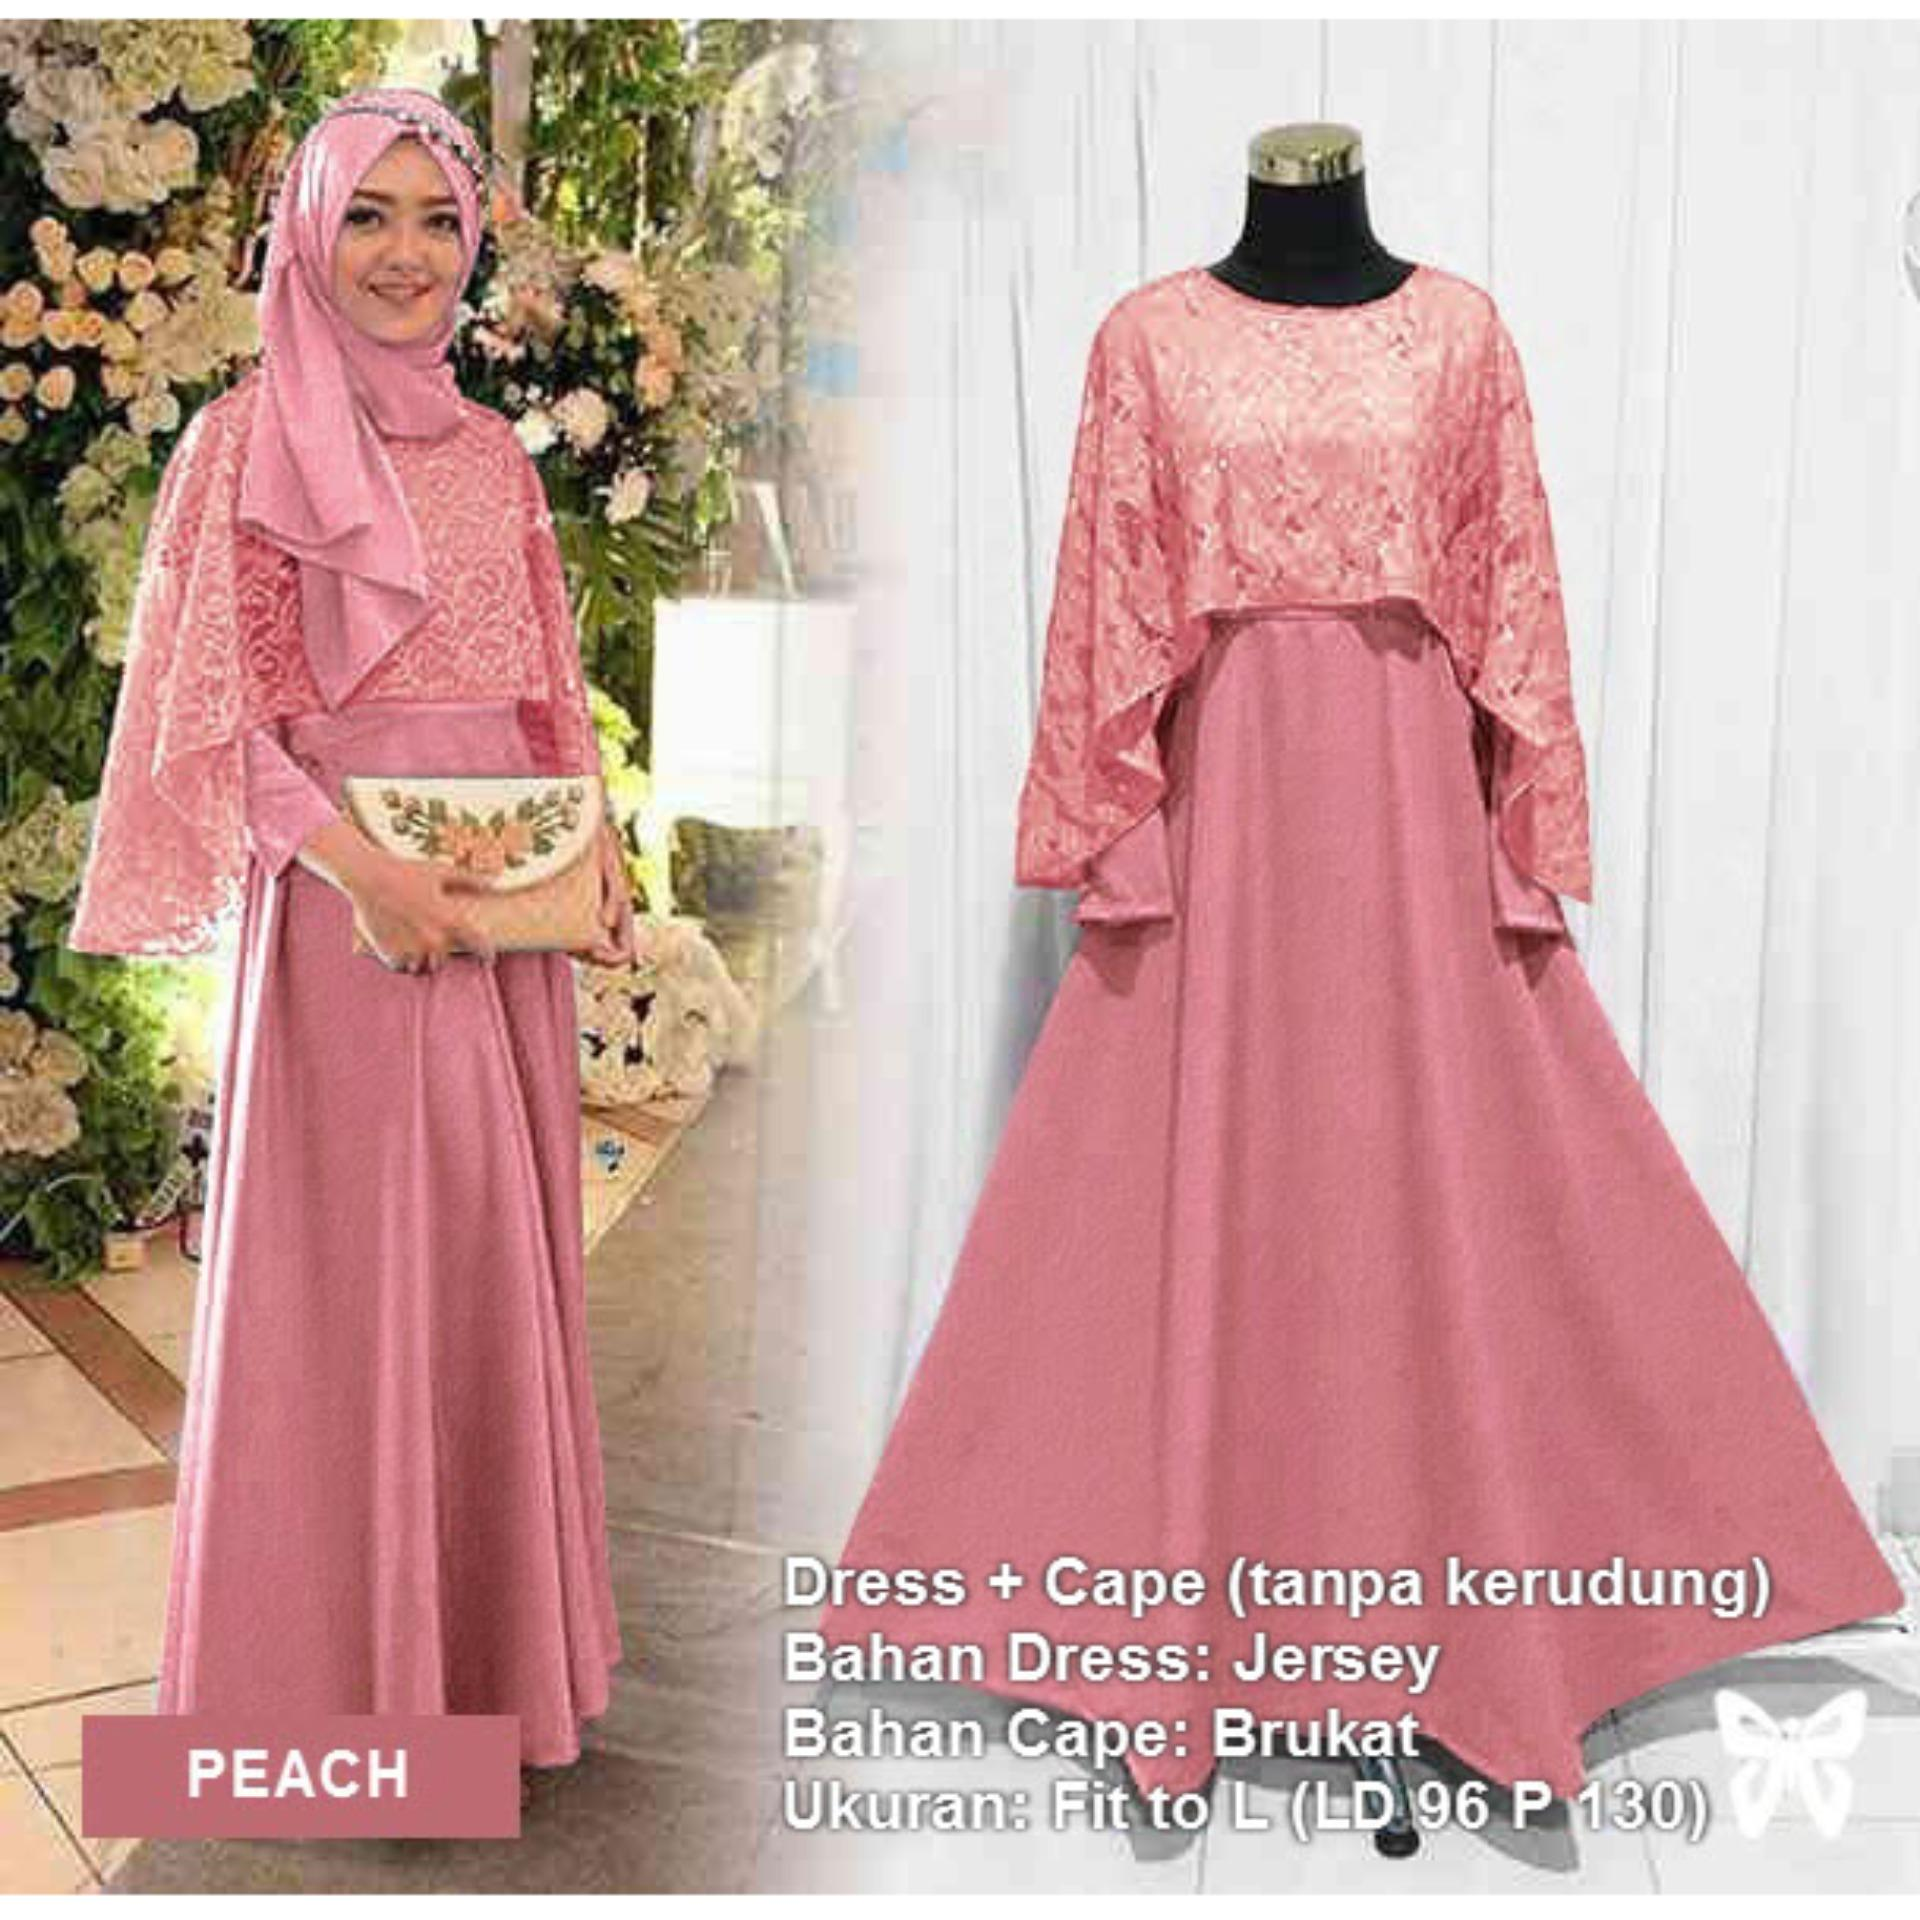 Maxi Dress Lengan Panjang Set 2 in 1 Cape Brukat MSR088 / Gamis Syari / Gaun